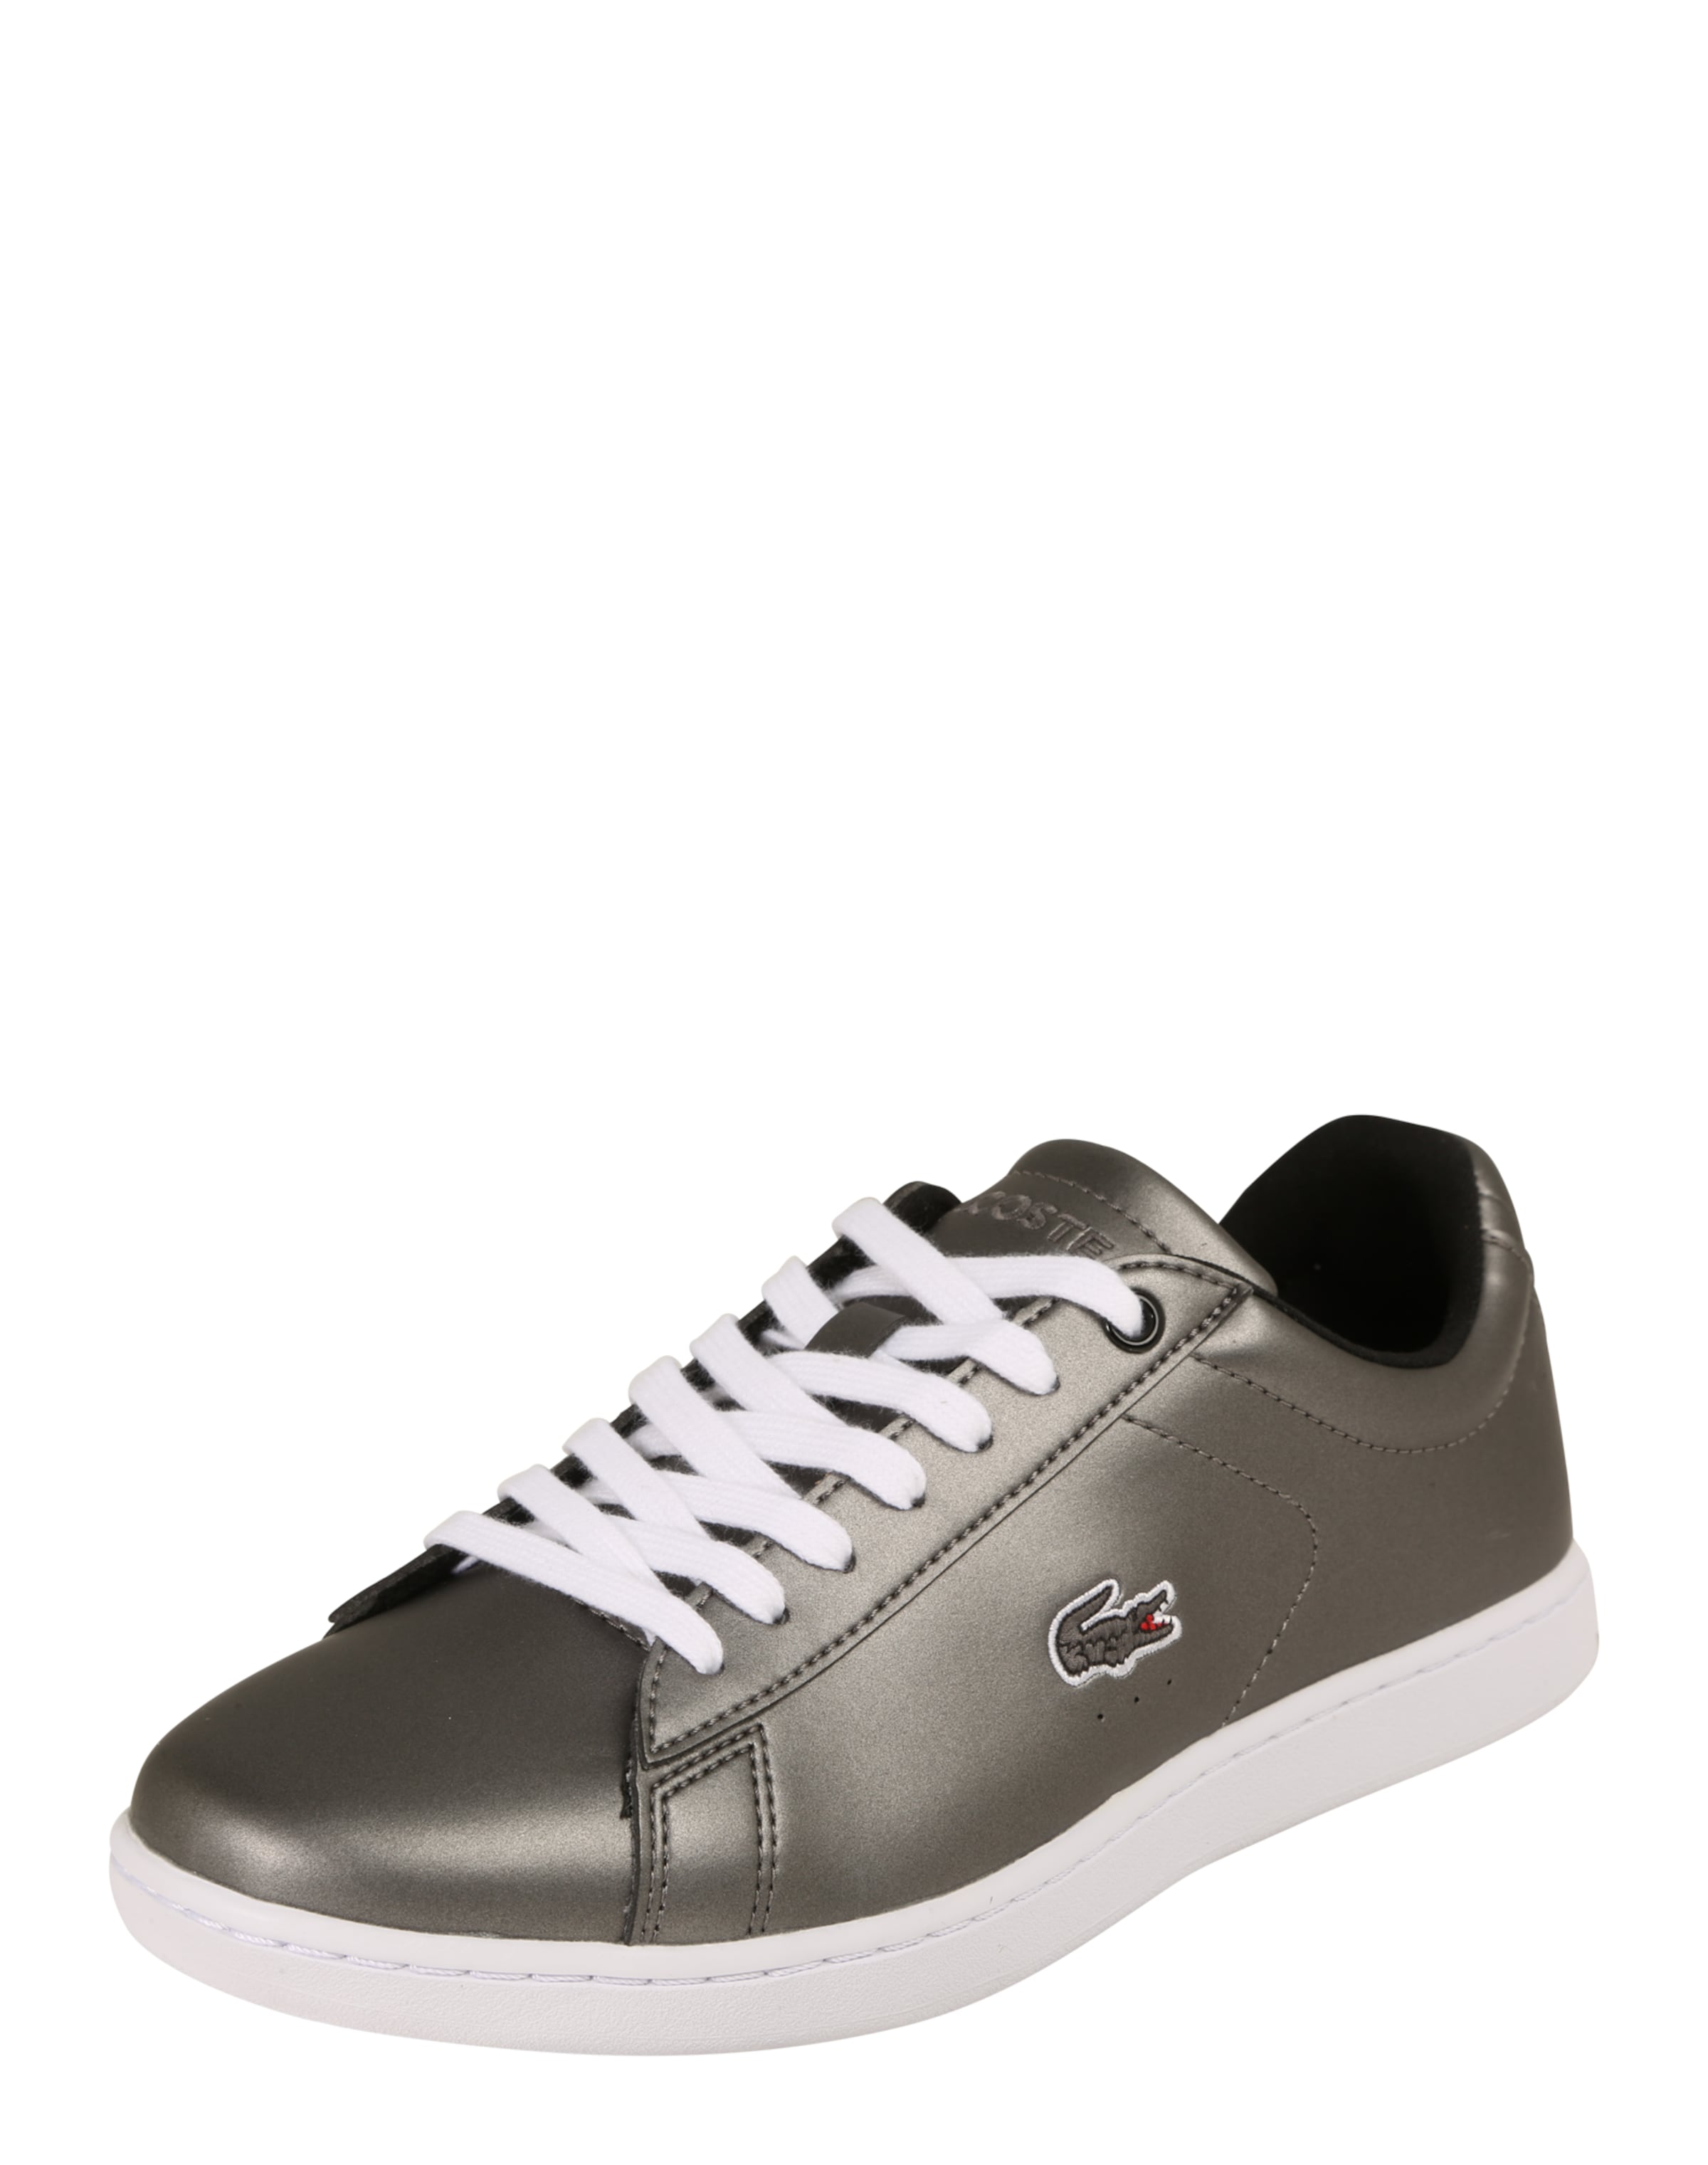 LACOSTE Sneakers Carnaby Verschleißfeste billige Schuhe